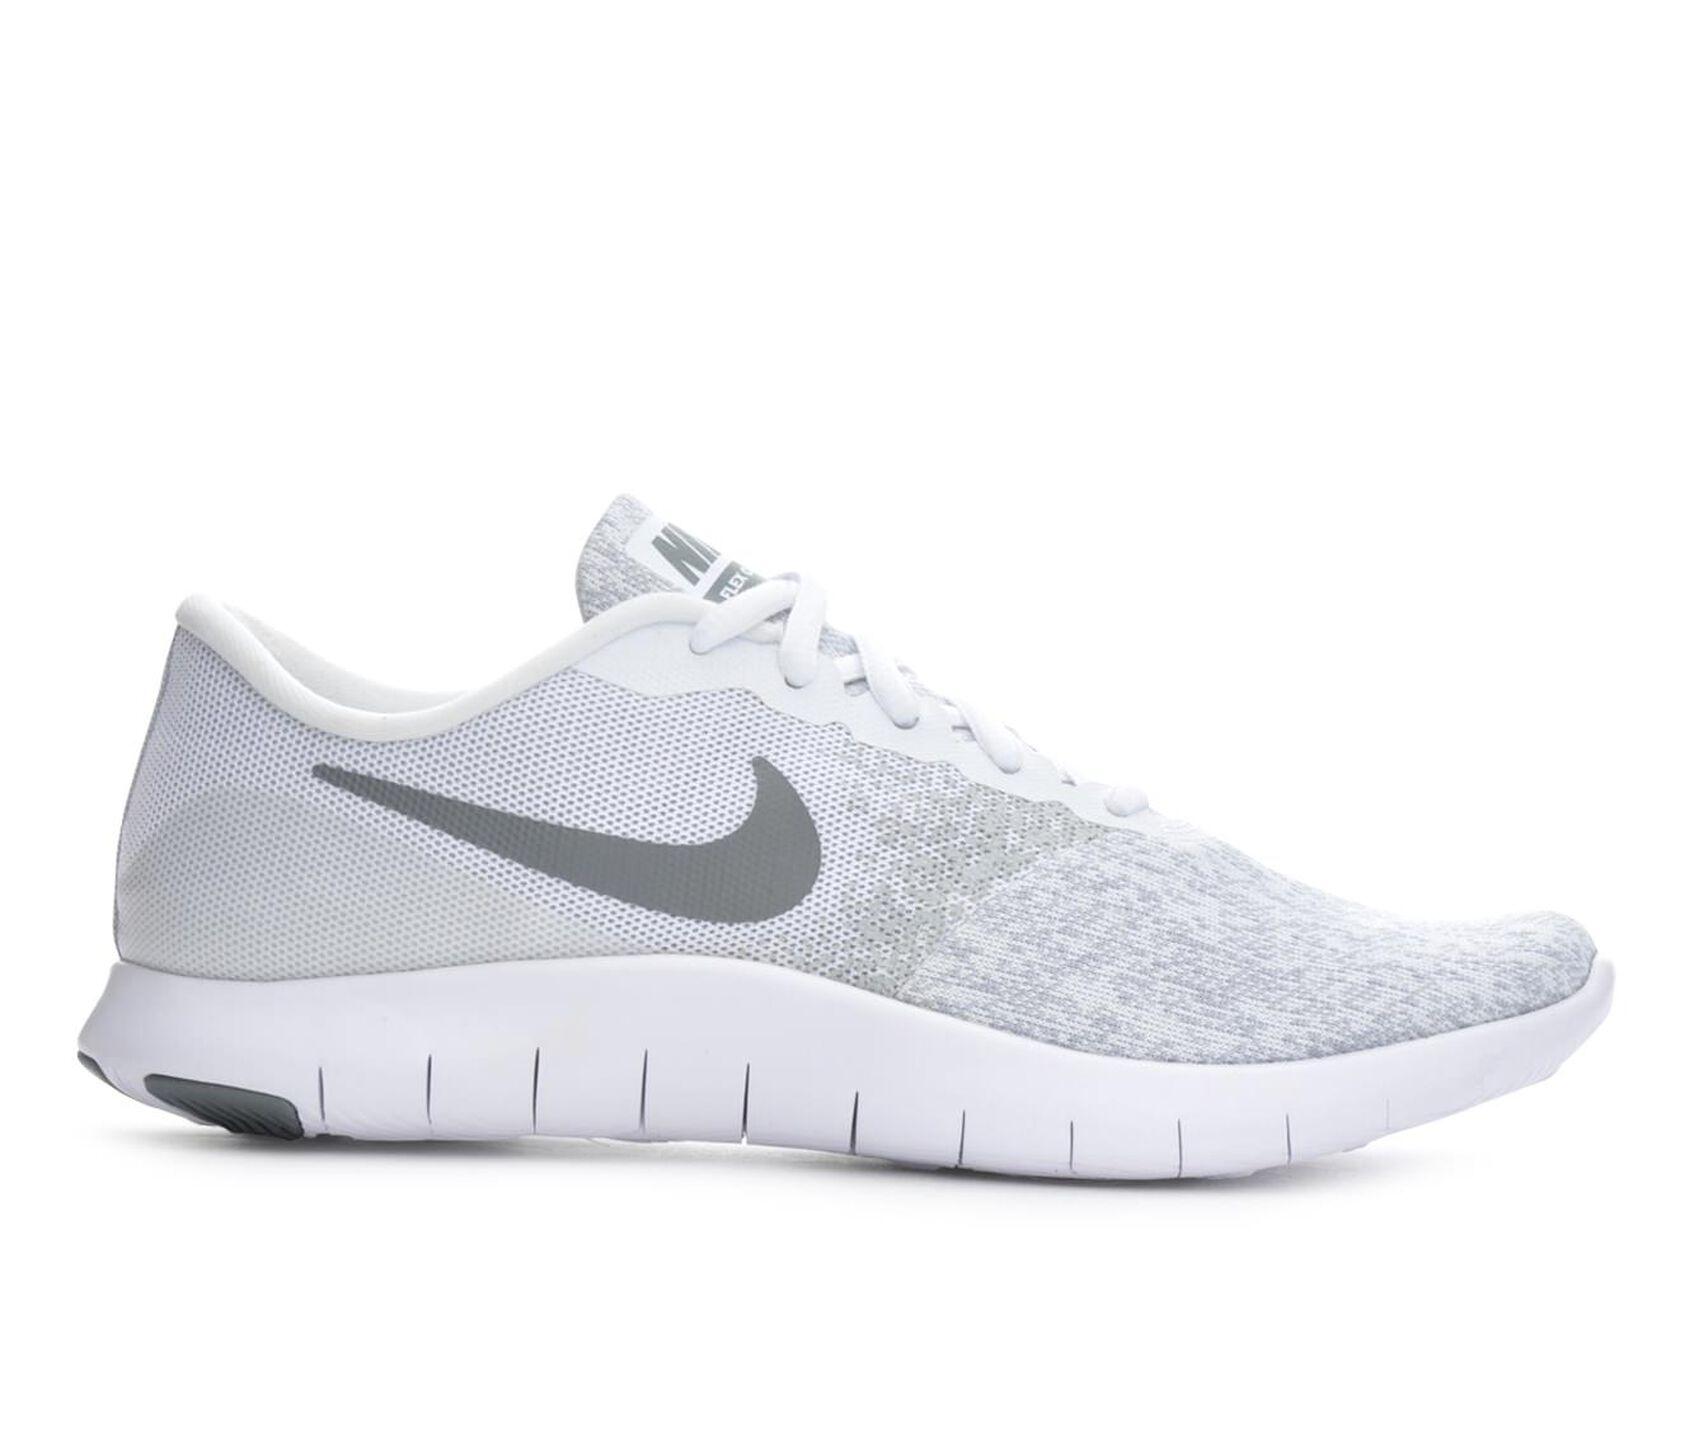 548d21a23c ... Nike Flex Contact Running Shoes. Carousel Controls